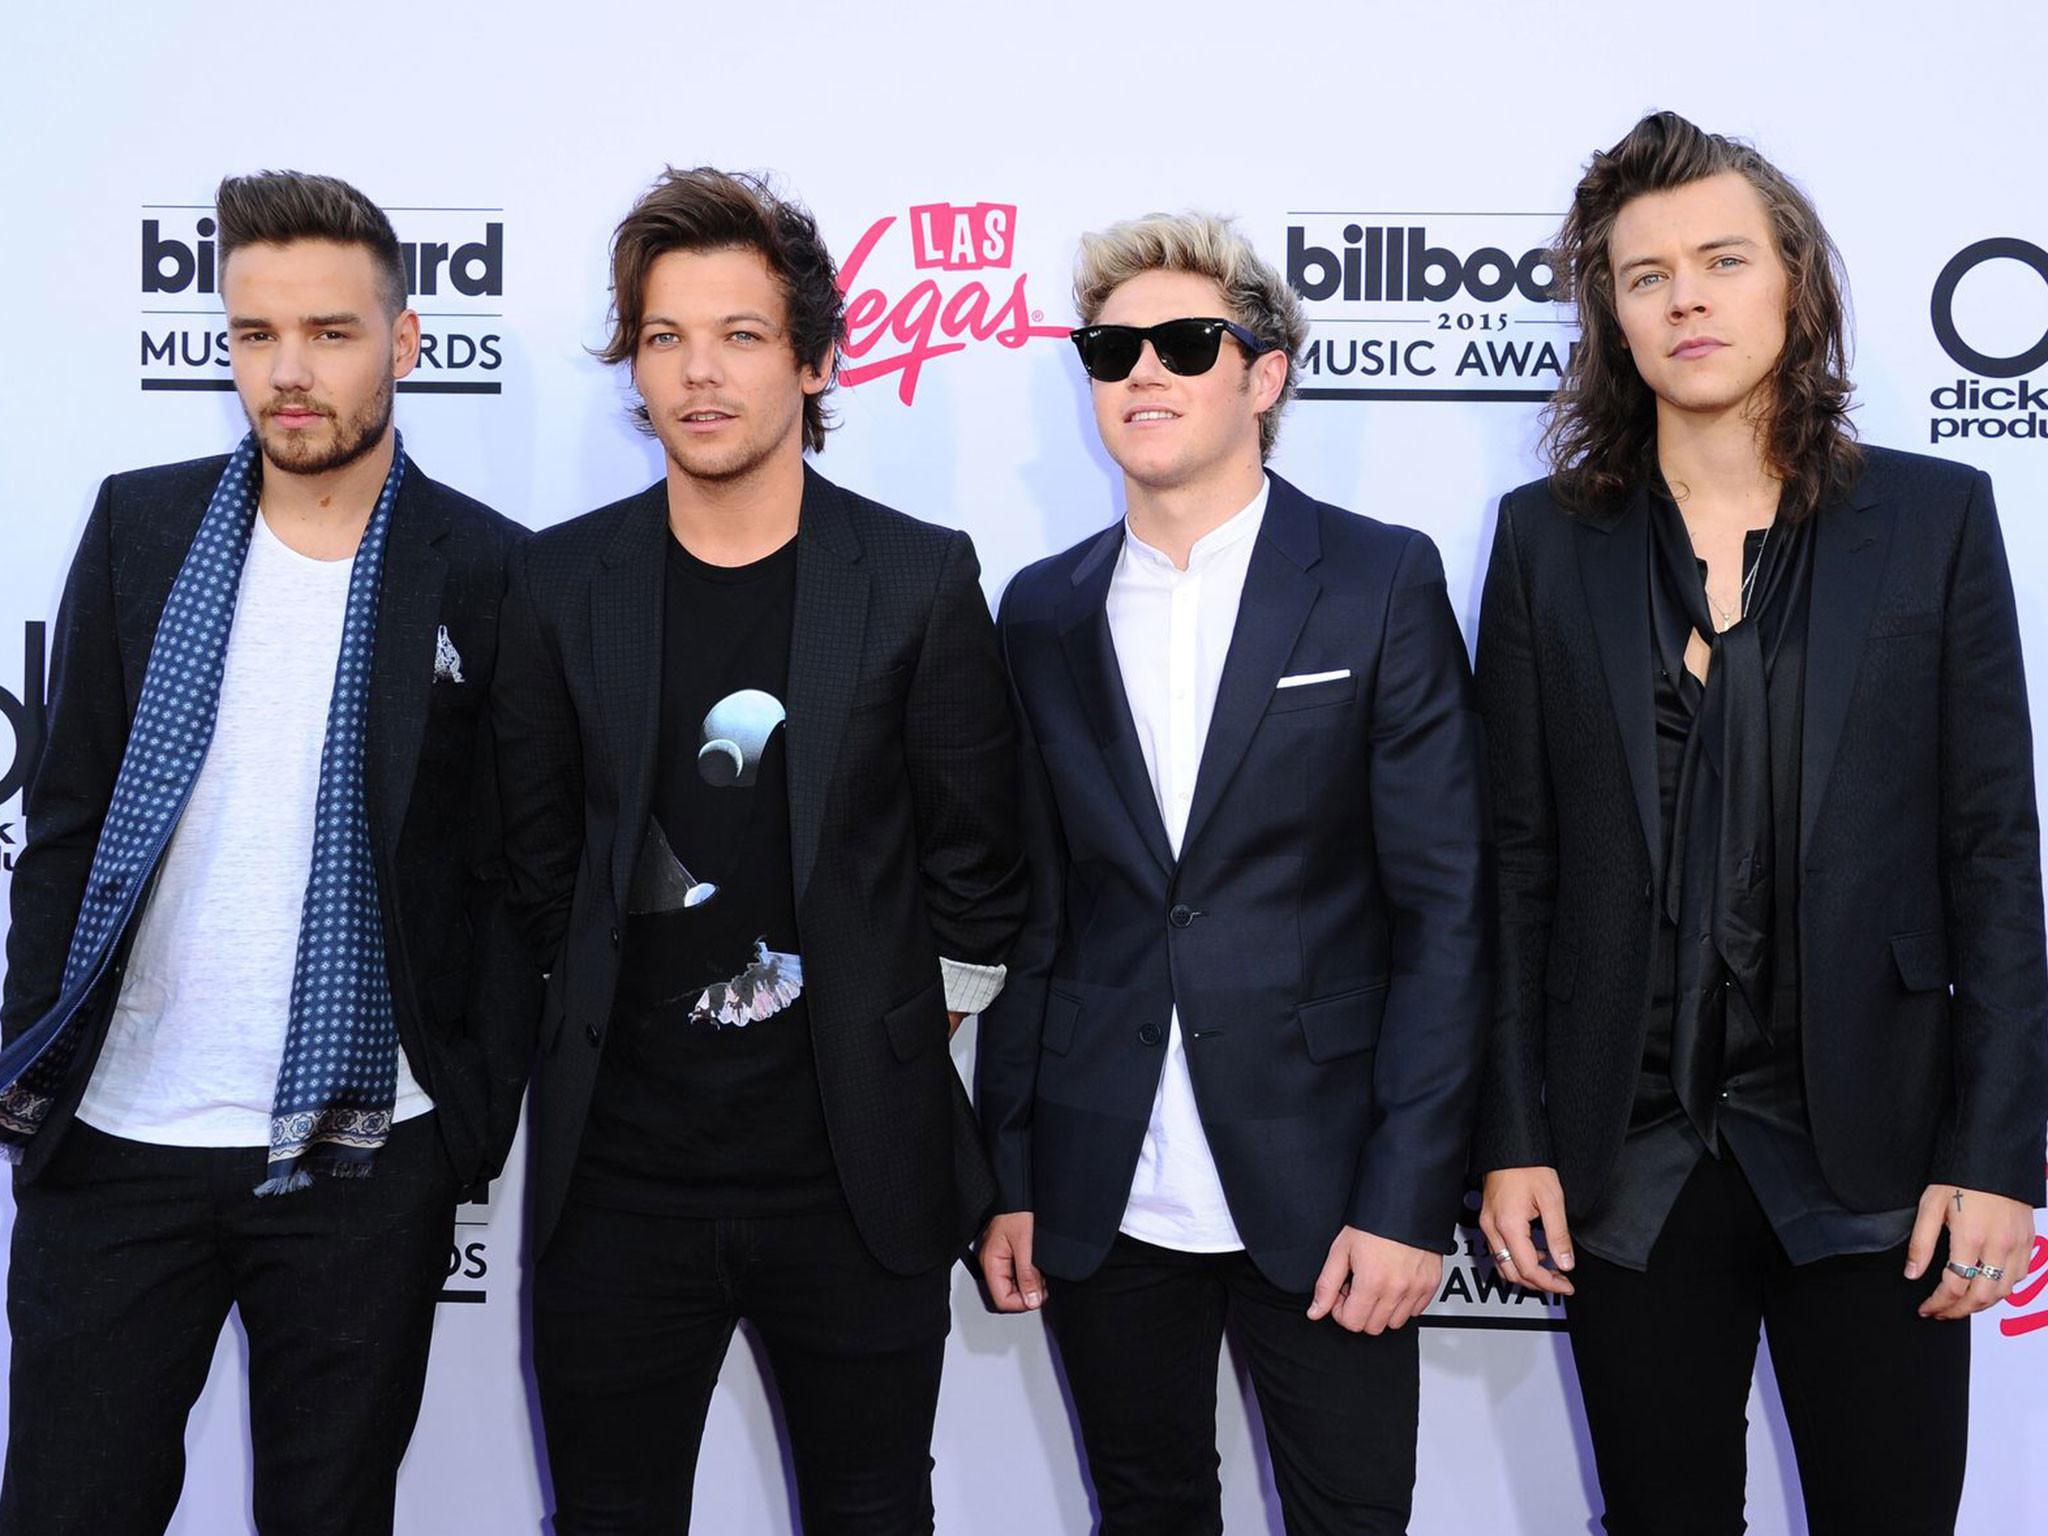 One Direction split: The best worst jokes as 1D hiatus rumours swirl | The  Independent